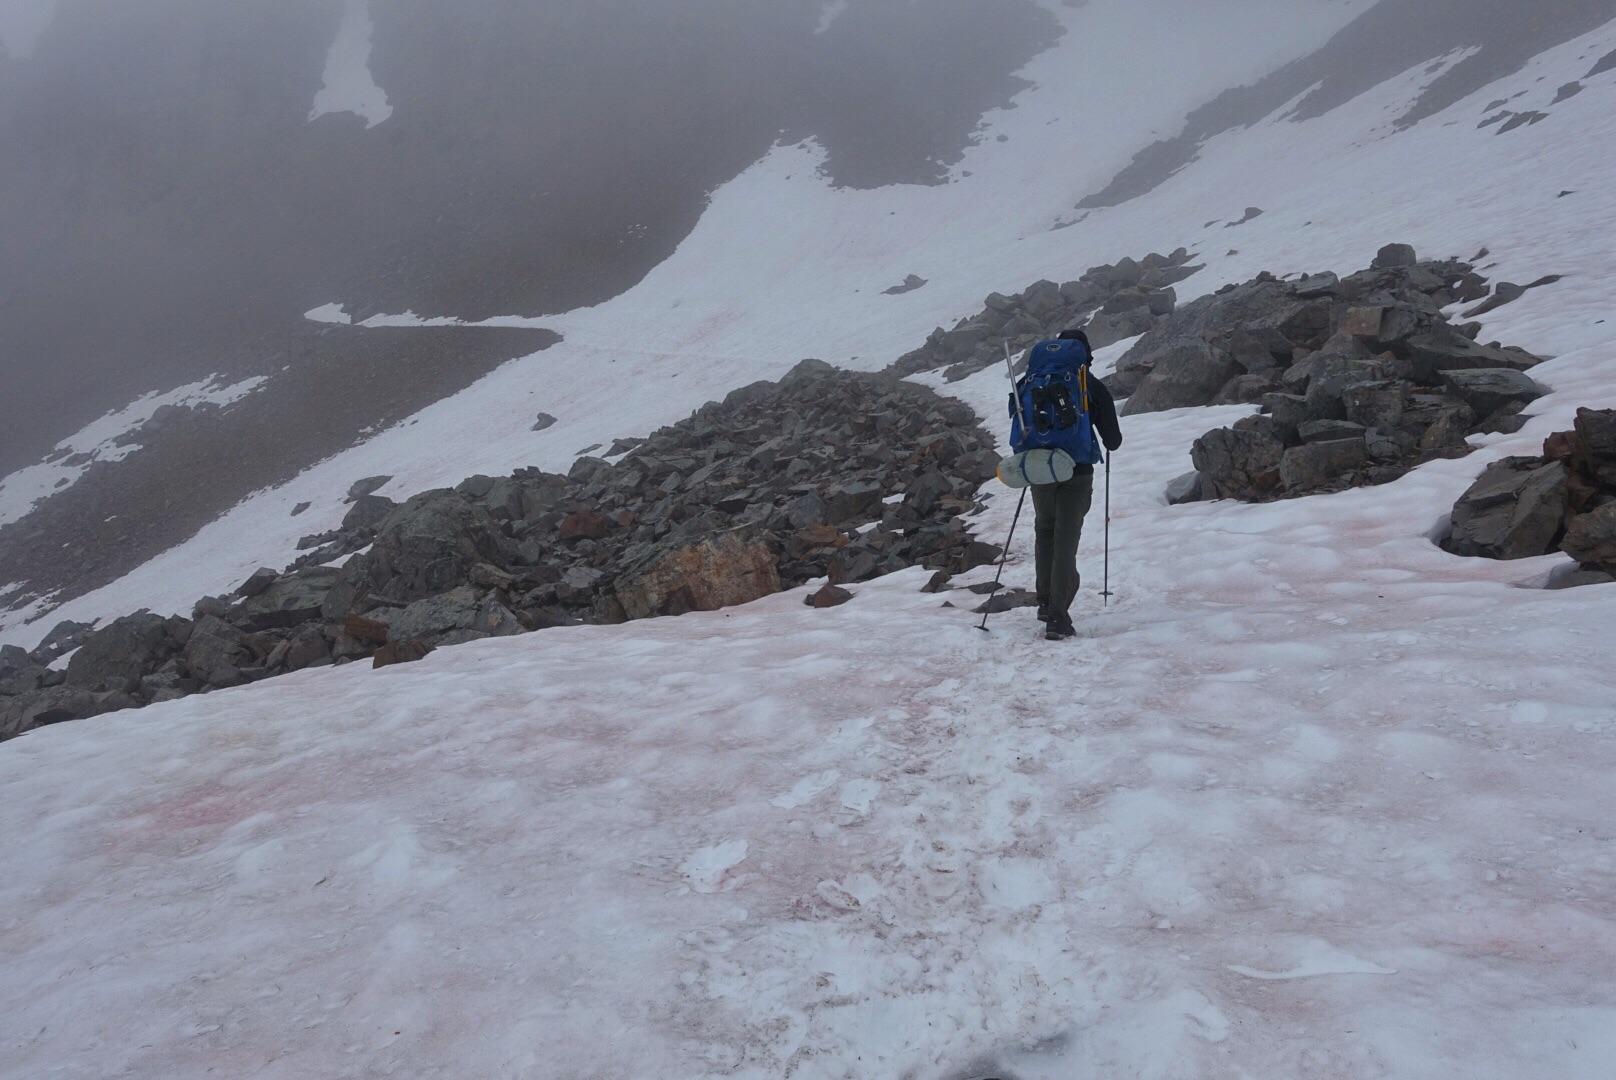 Andrew crossing one of many wet, misty snowfields south of Tatie Peak